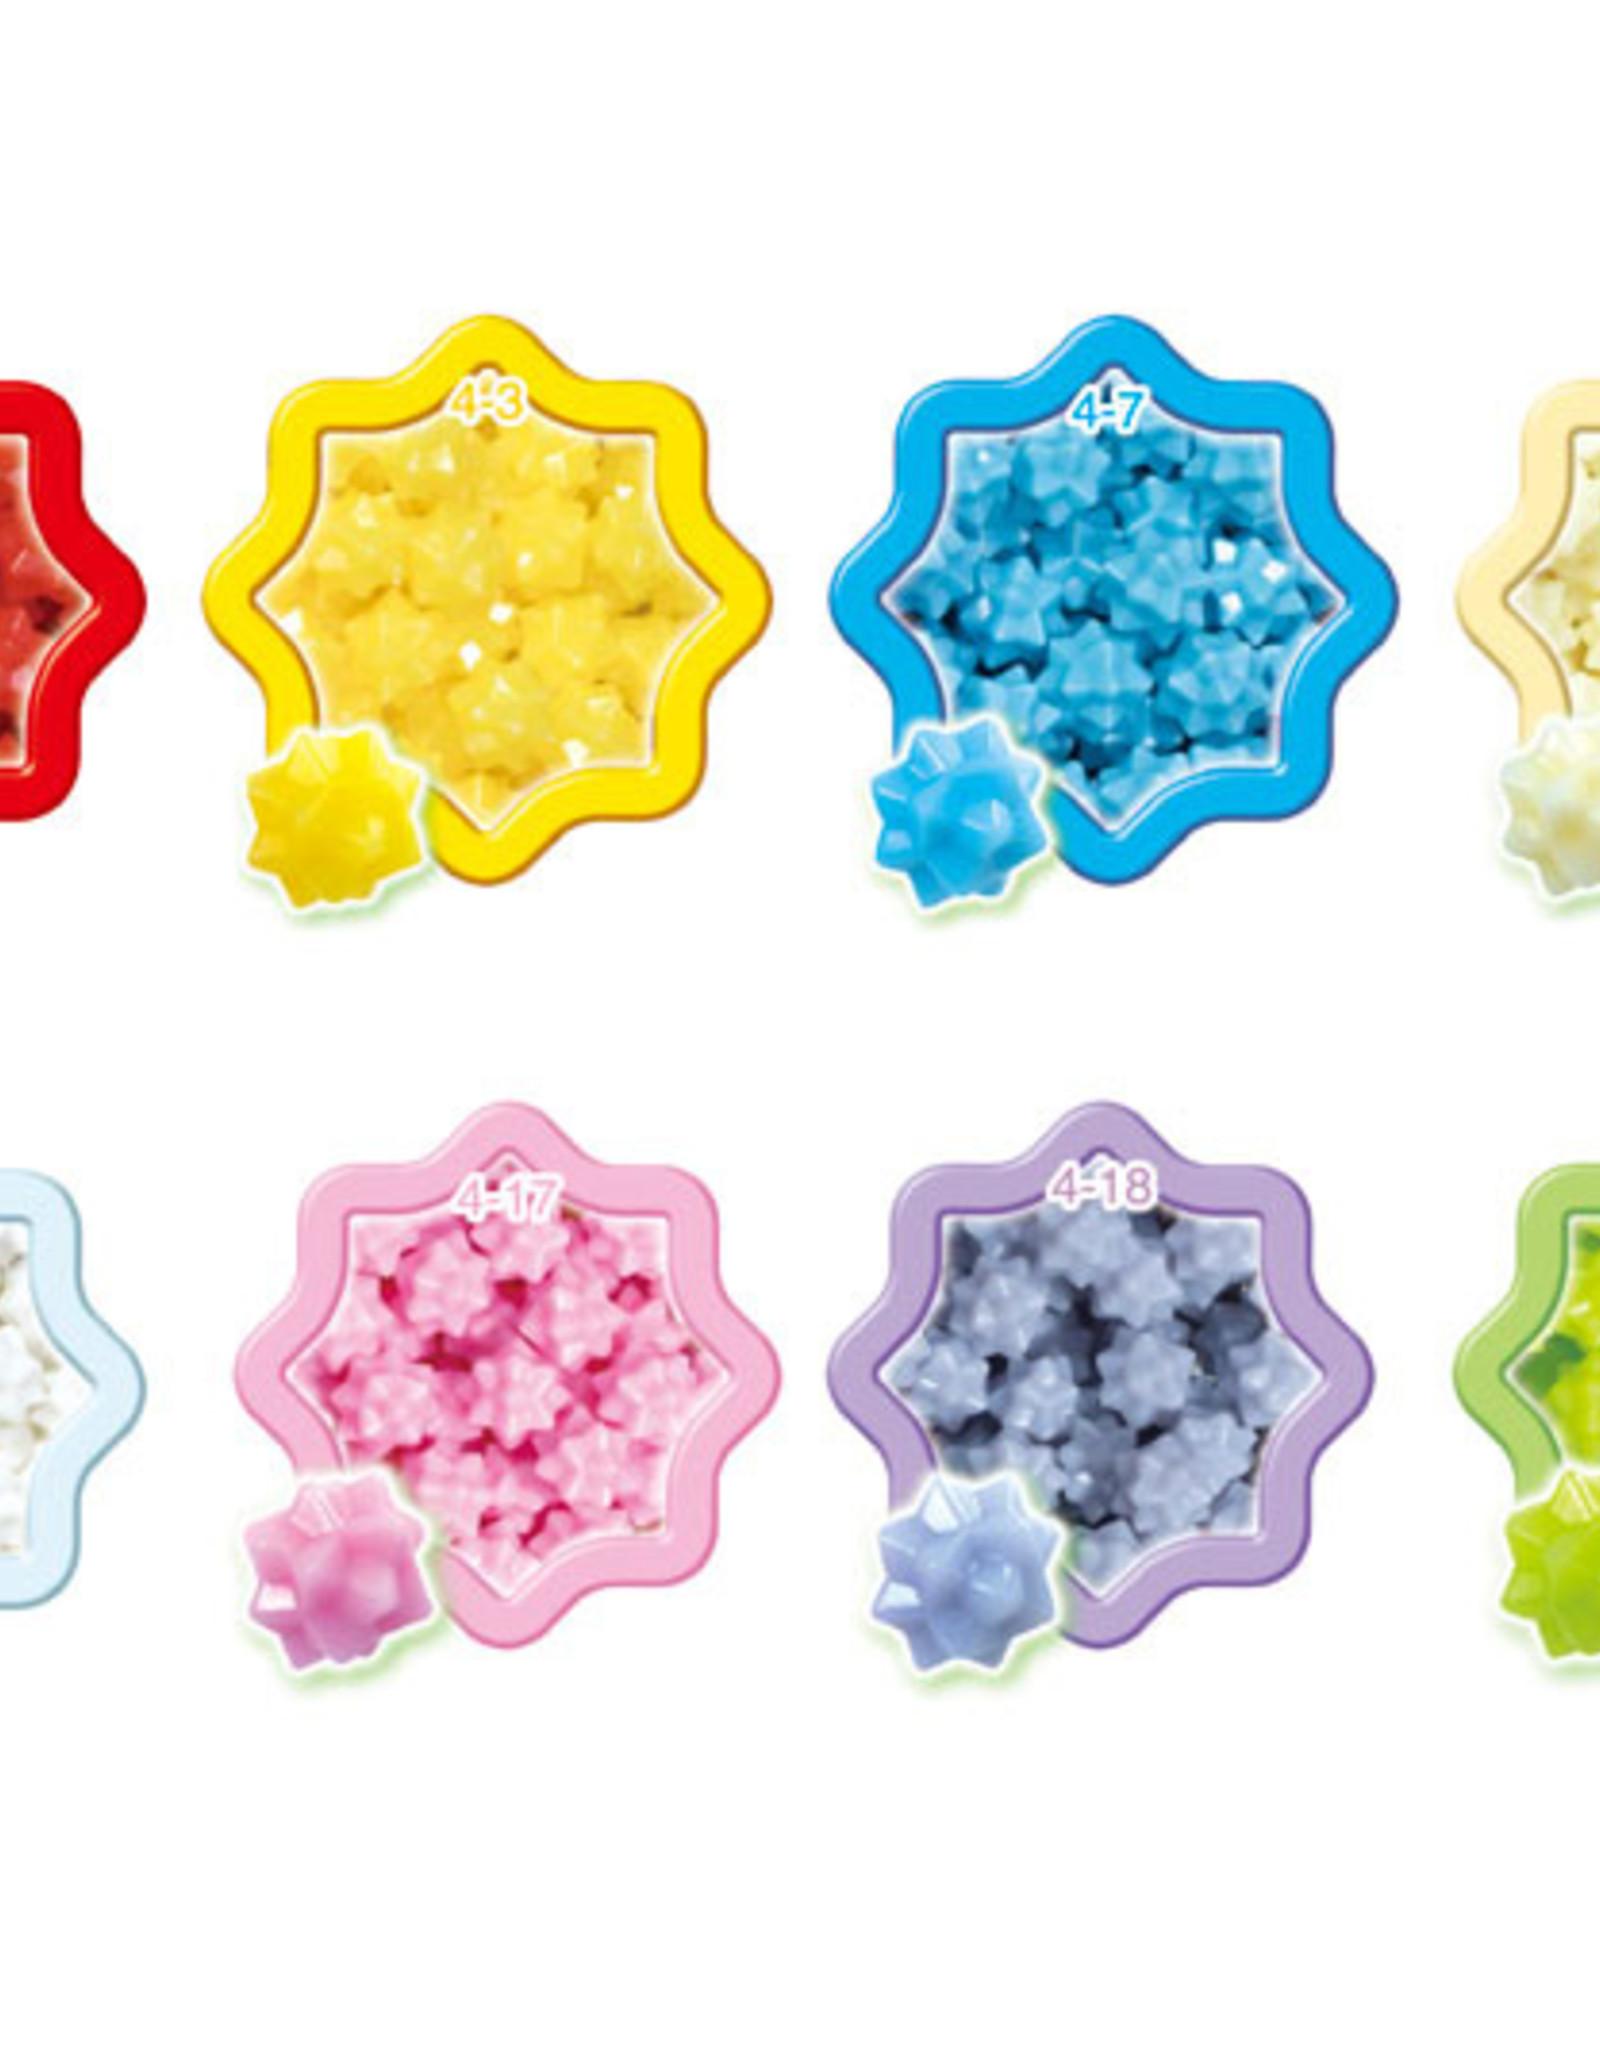 Aquabeads Aquabeads - Star Bead Pack